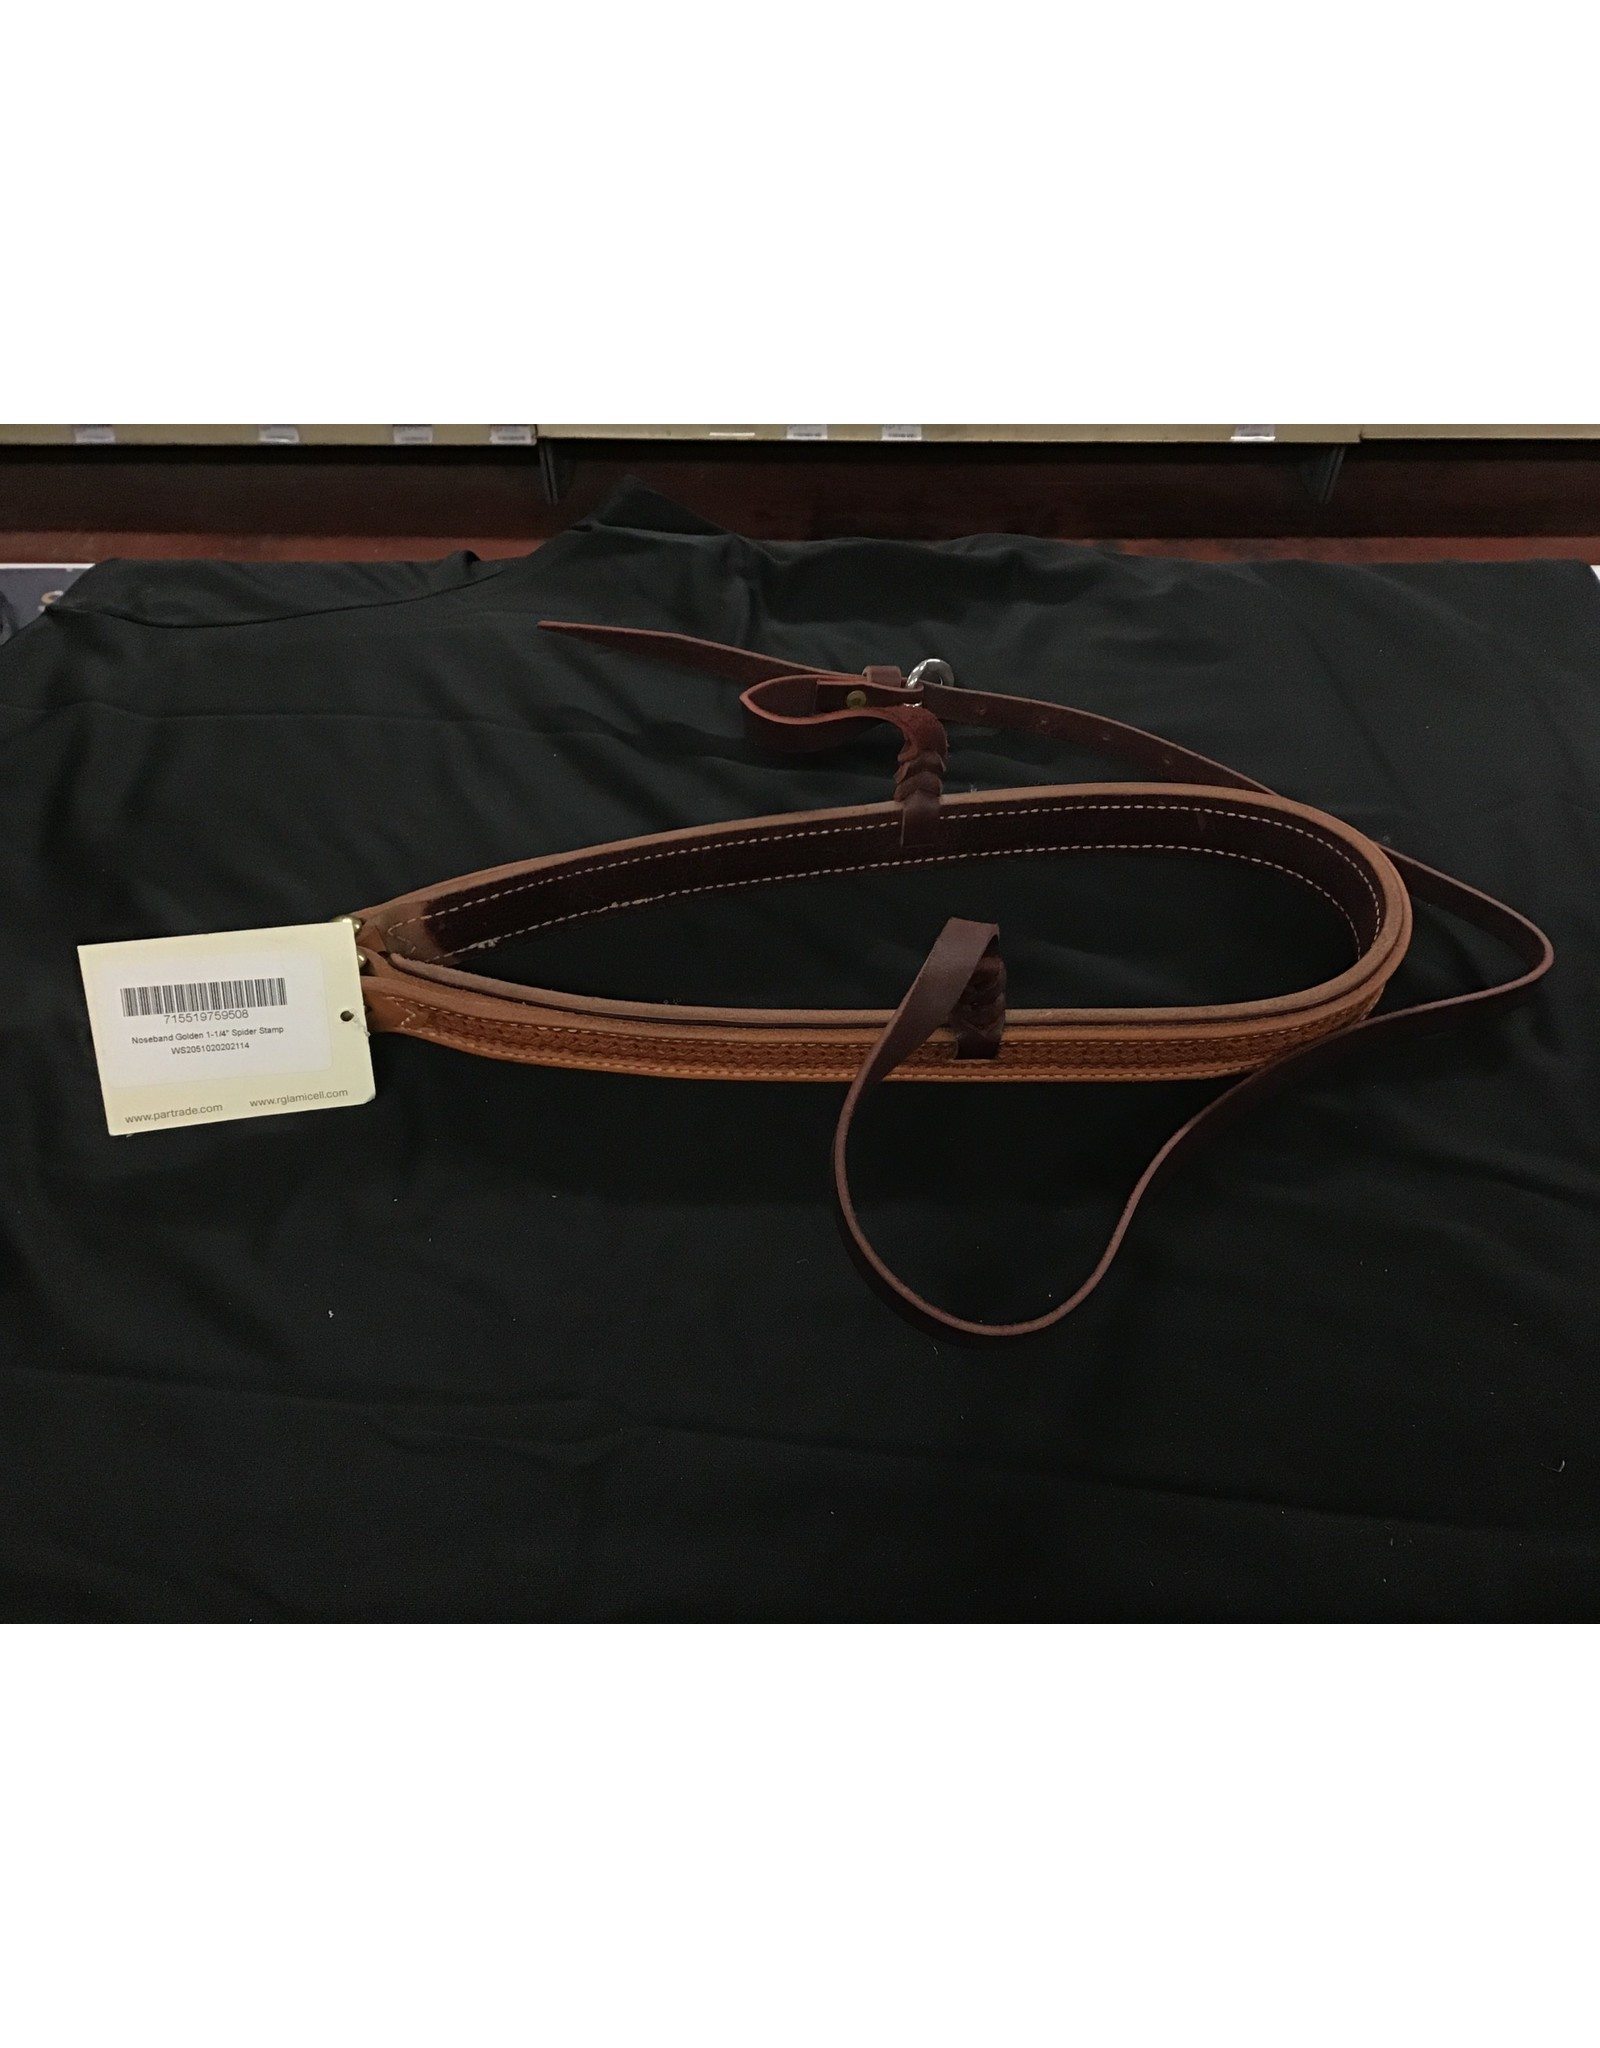 Partrade Noseband, Golden Spider Leather